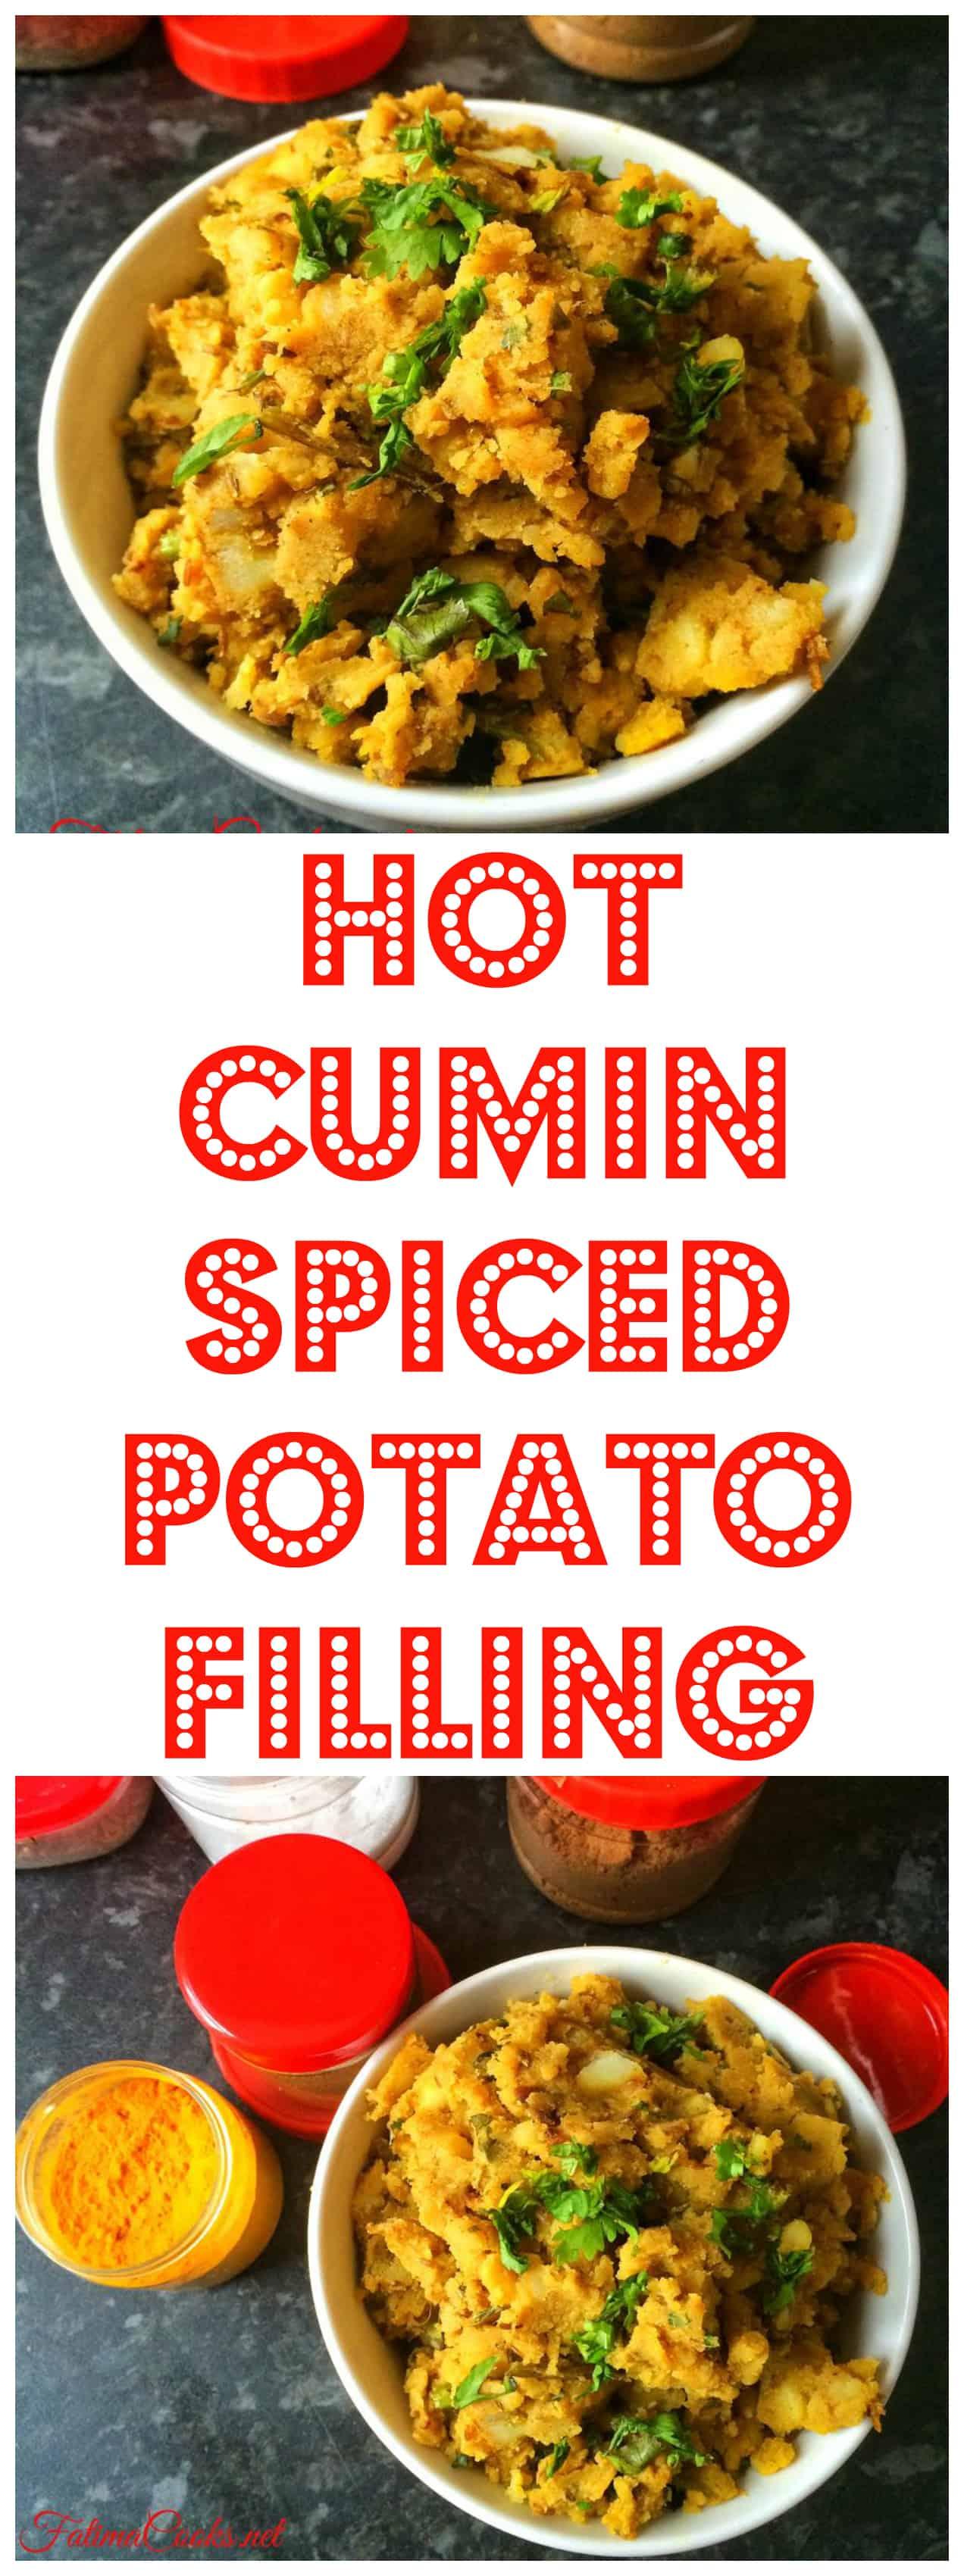 Hot Cumin Spiced Potato Filling for samosas, spring rolls, parathas etc @ FatimaCooks.net